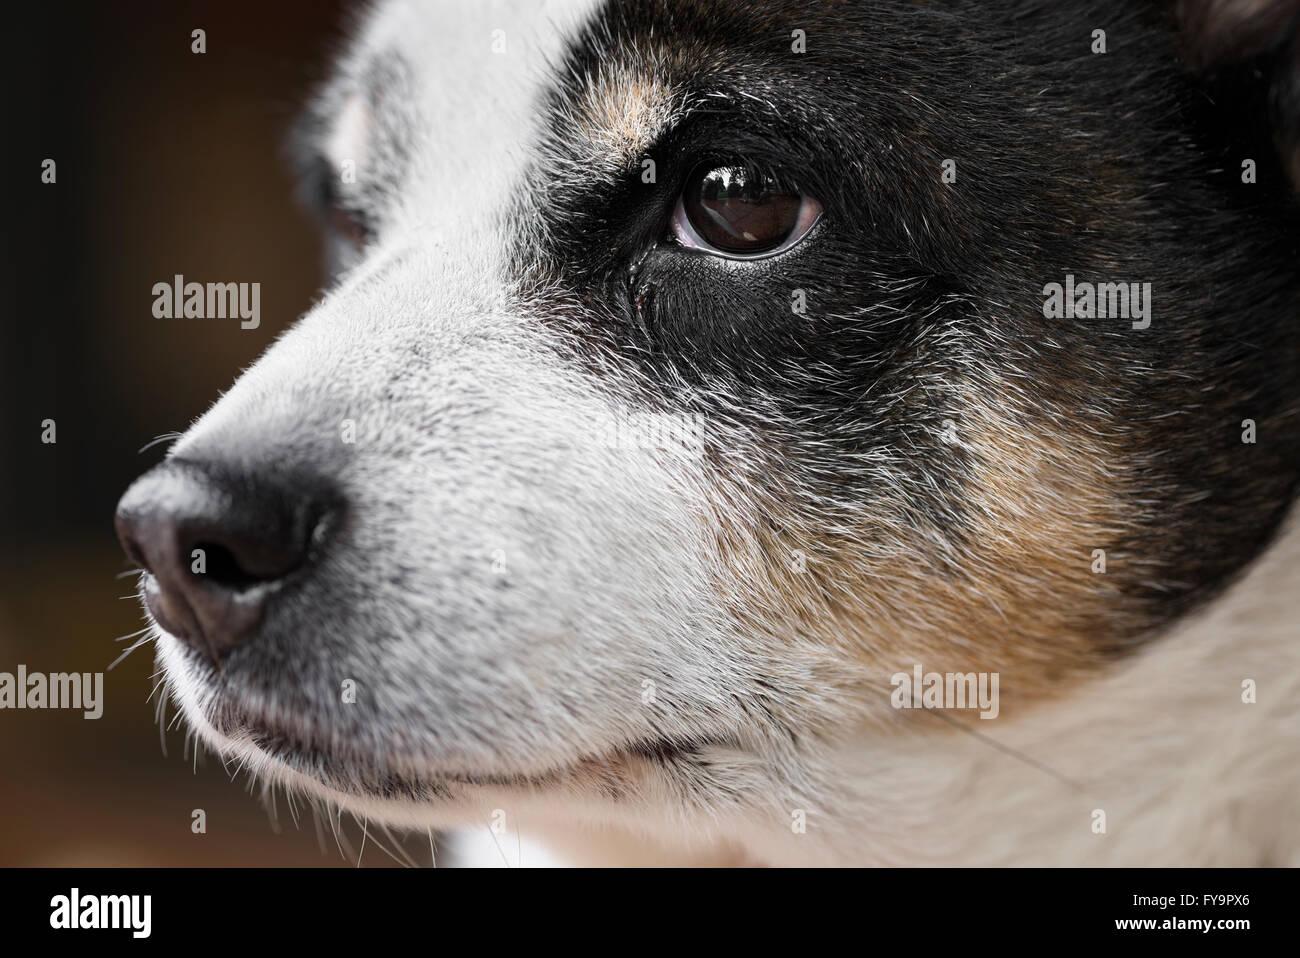 Cose up retrato de un viejo perro. Rat terrier perfil. Imagen De Stock